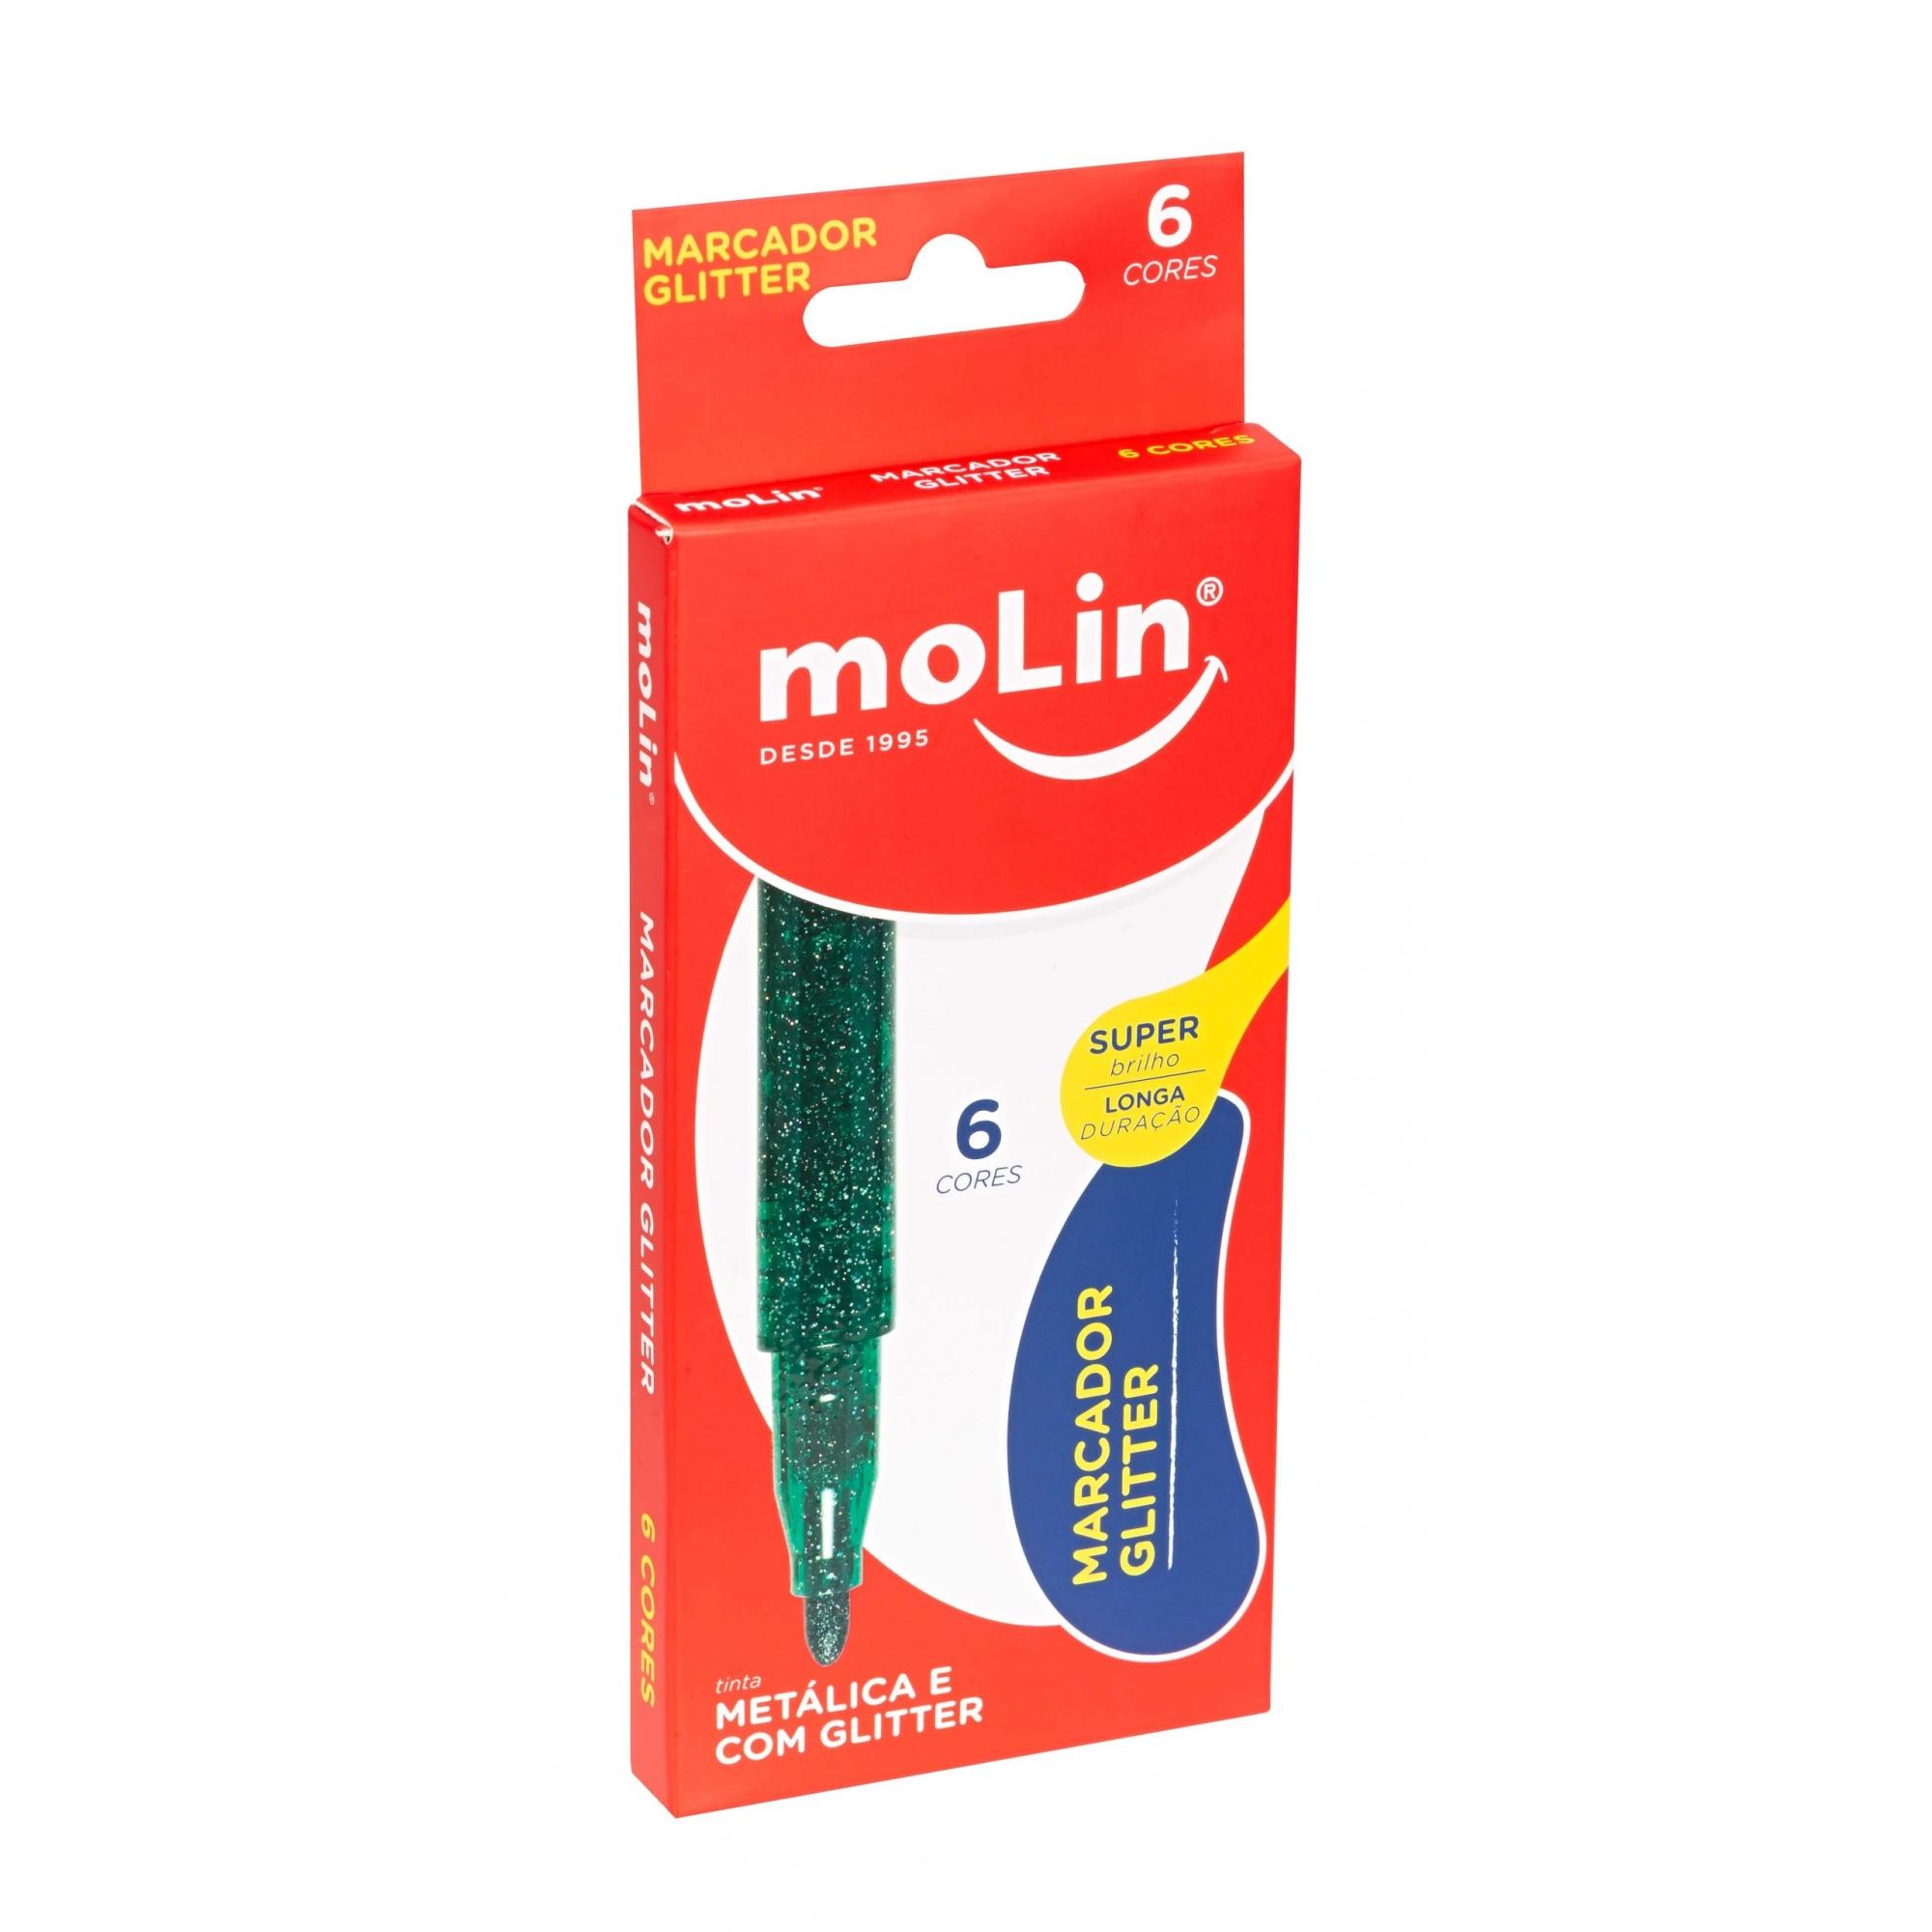 Marcador Metalico Glitter - Molin (6 cores)